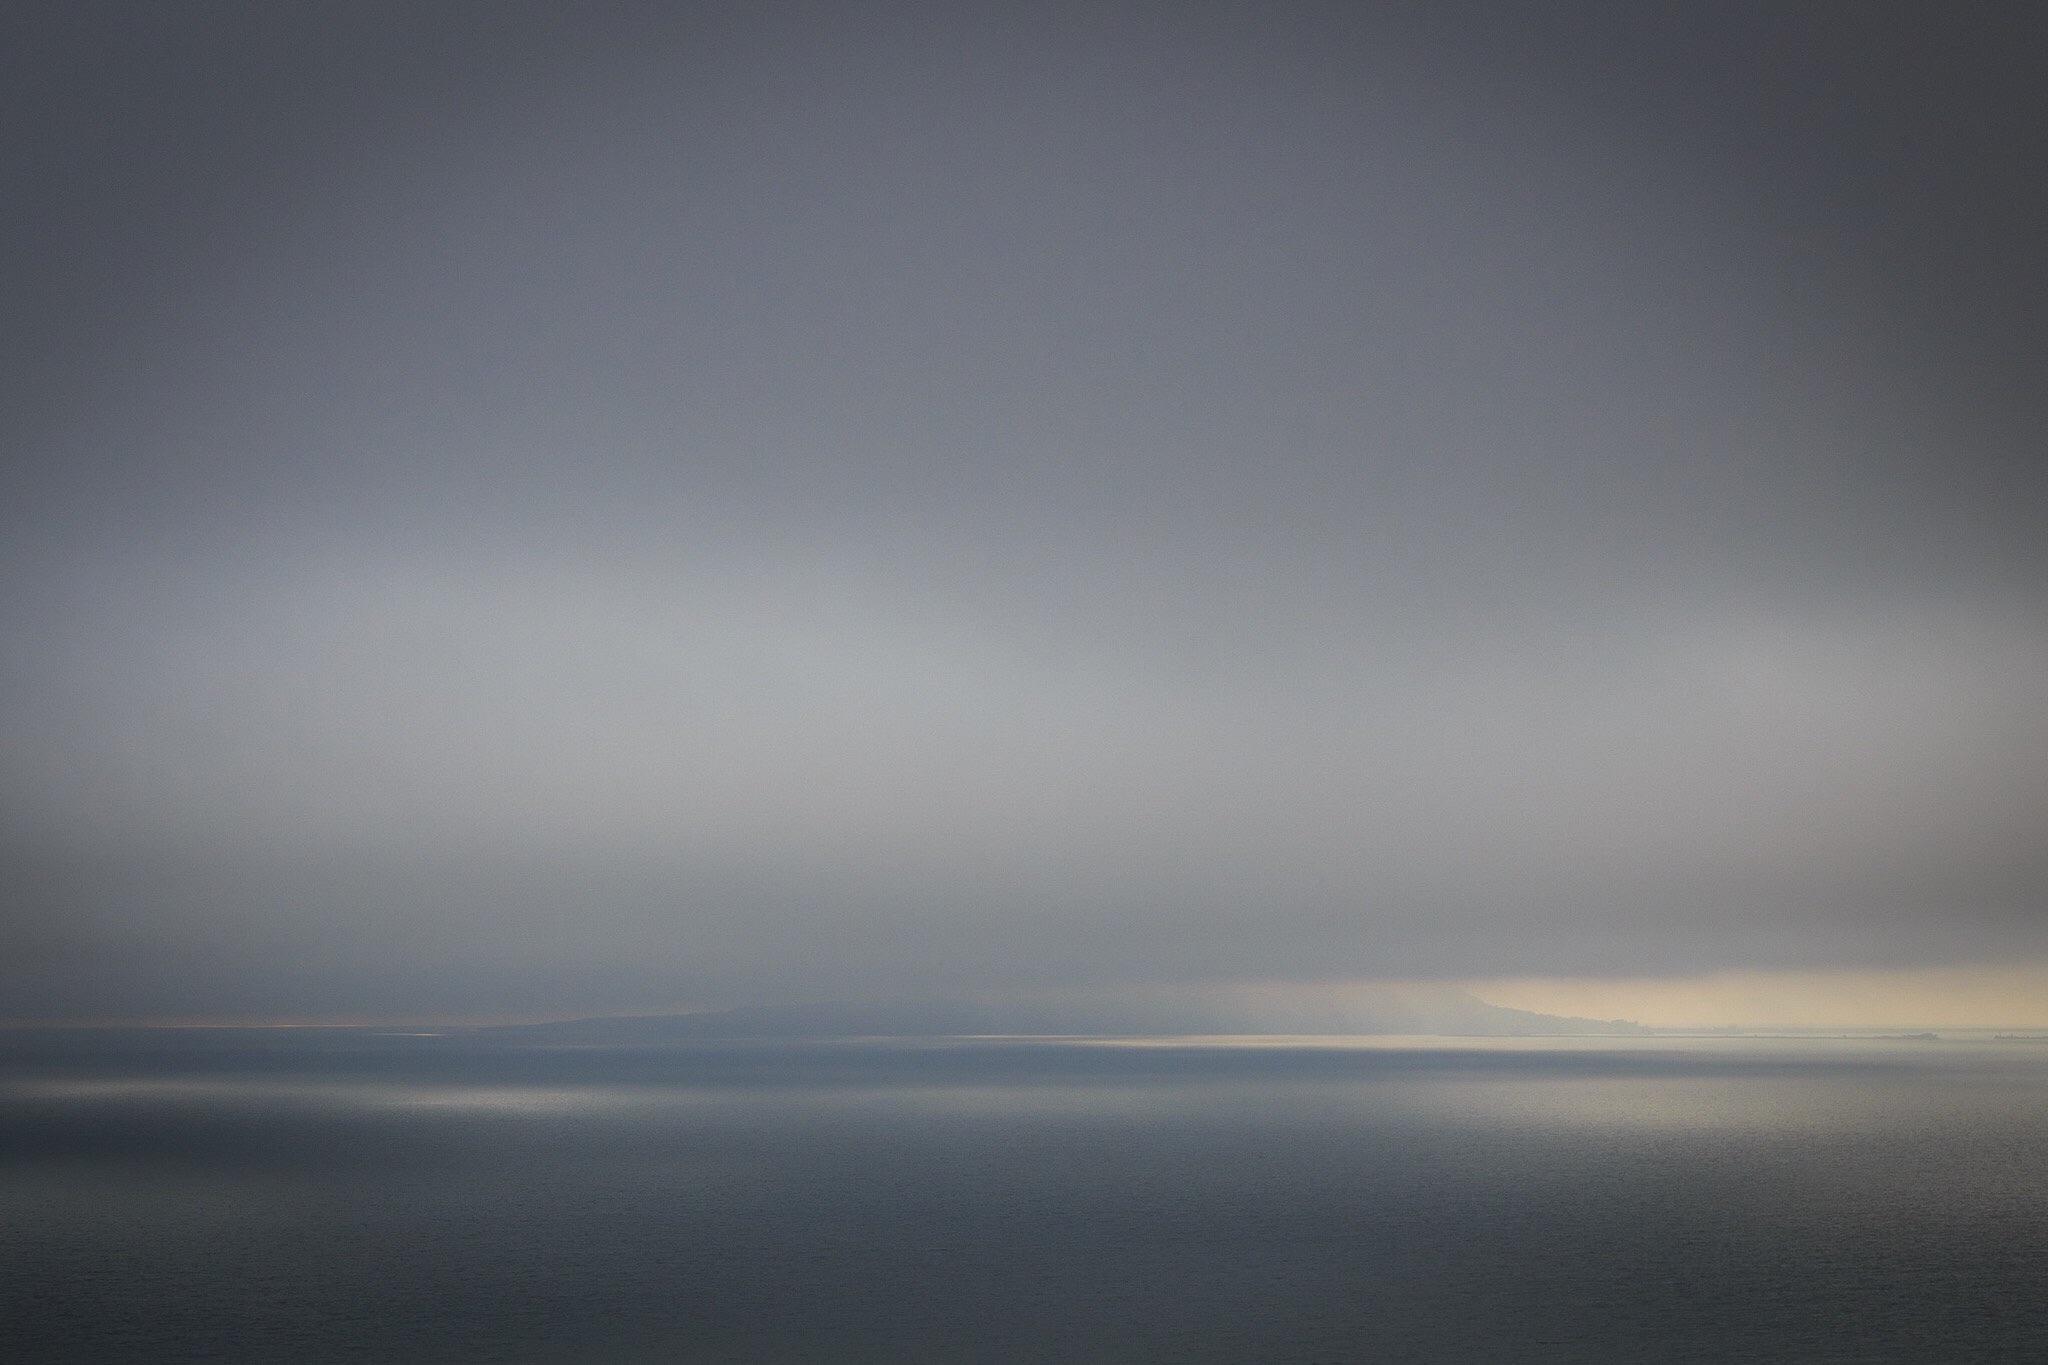 Portland by Rick McEvoy Dorset Photographer